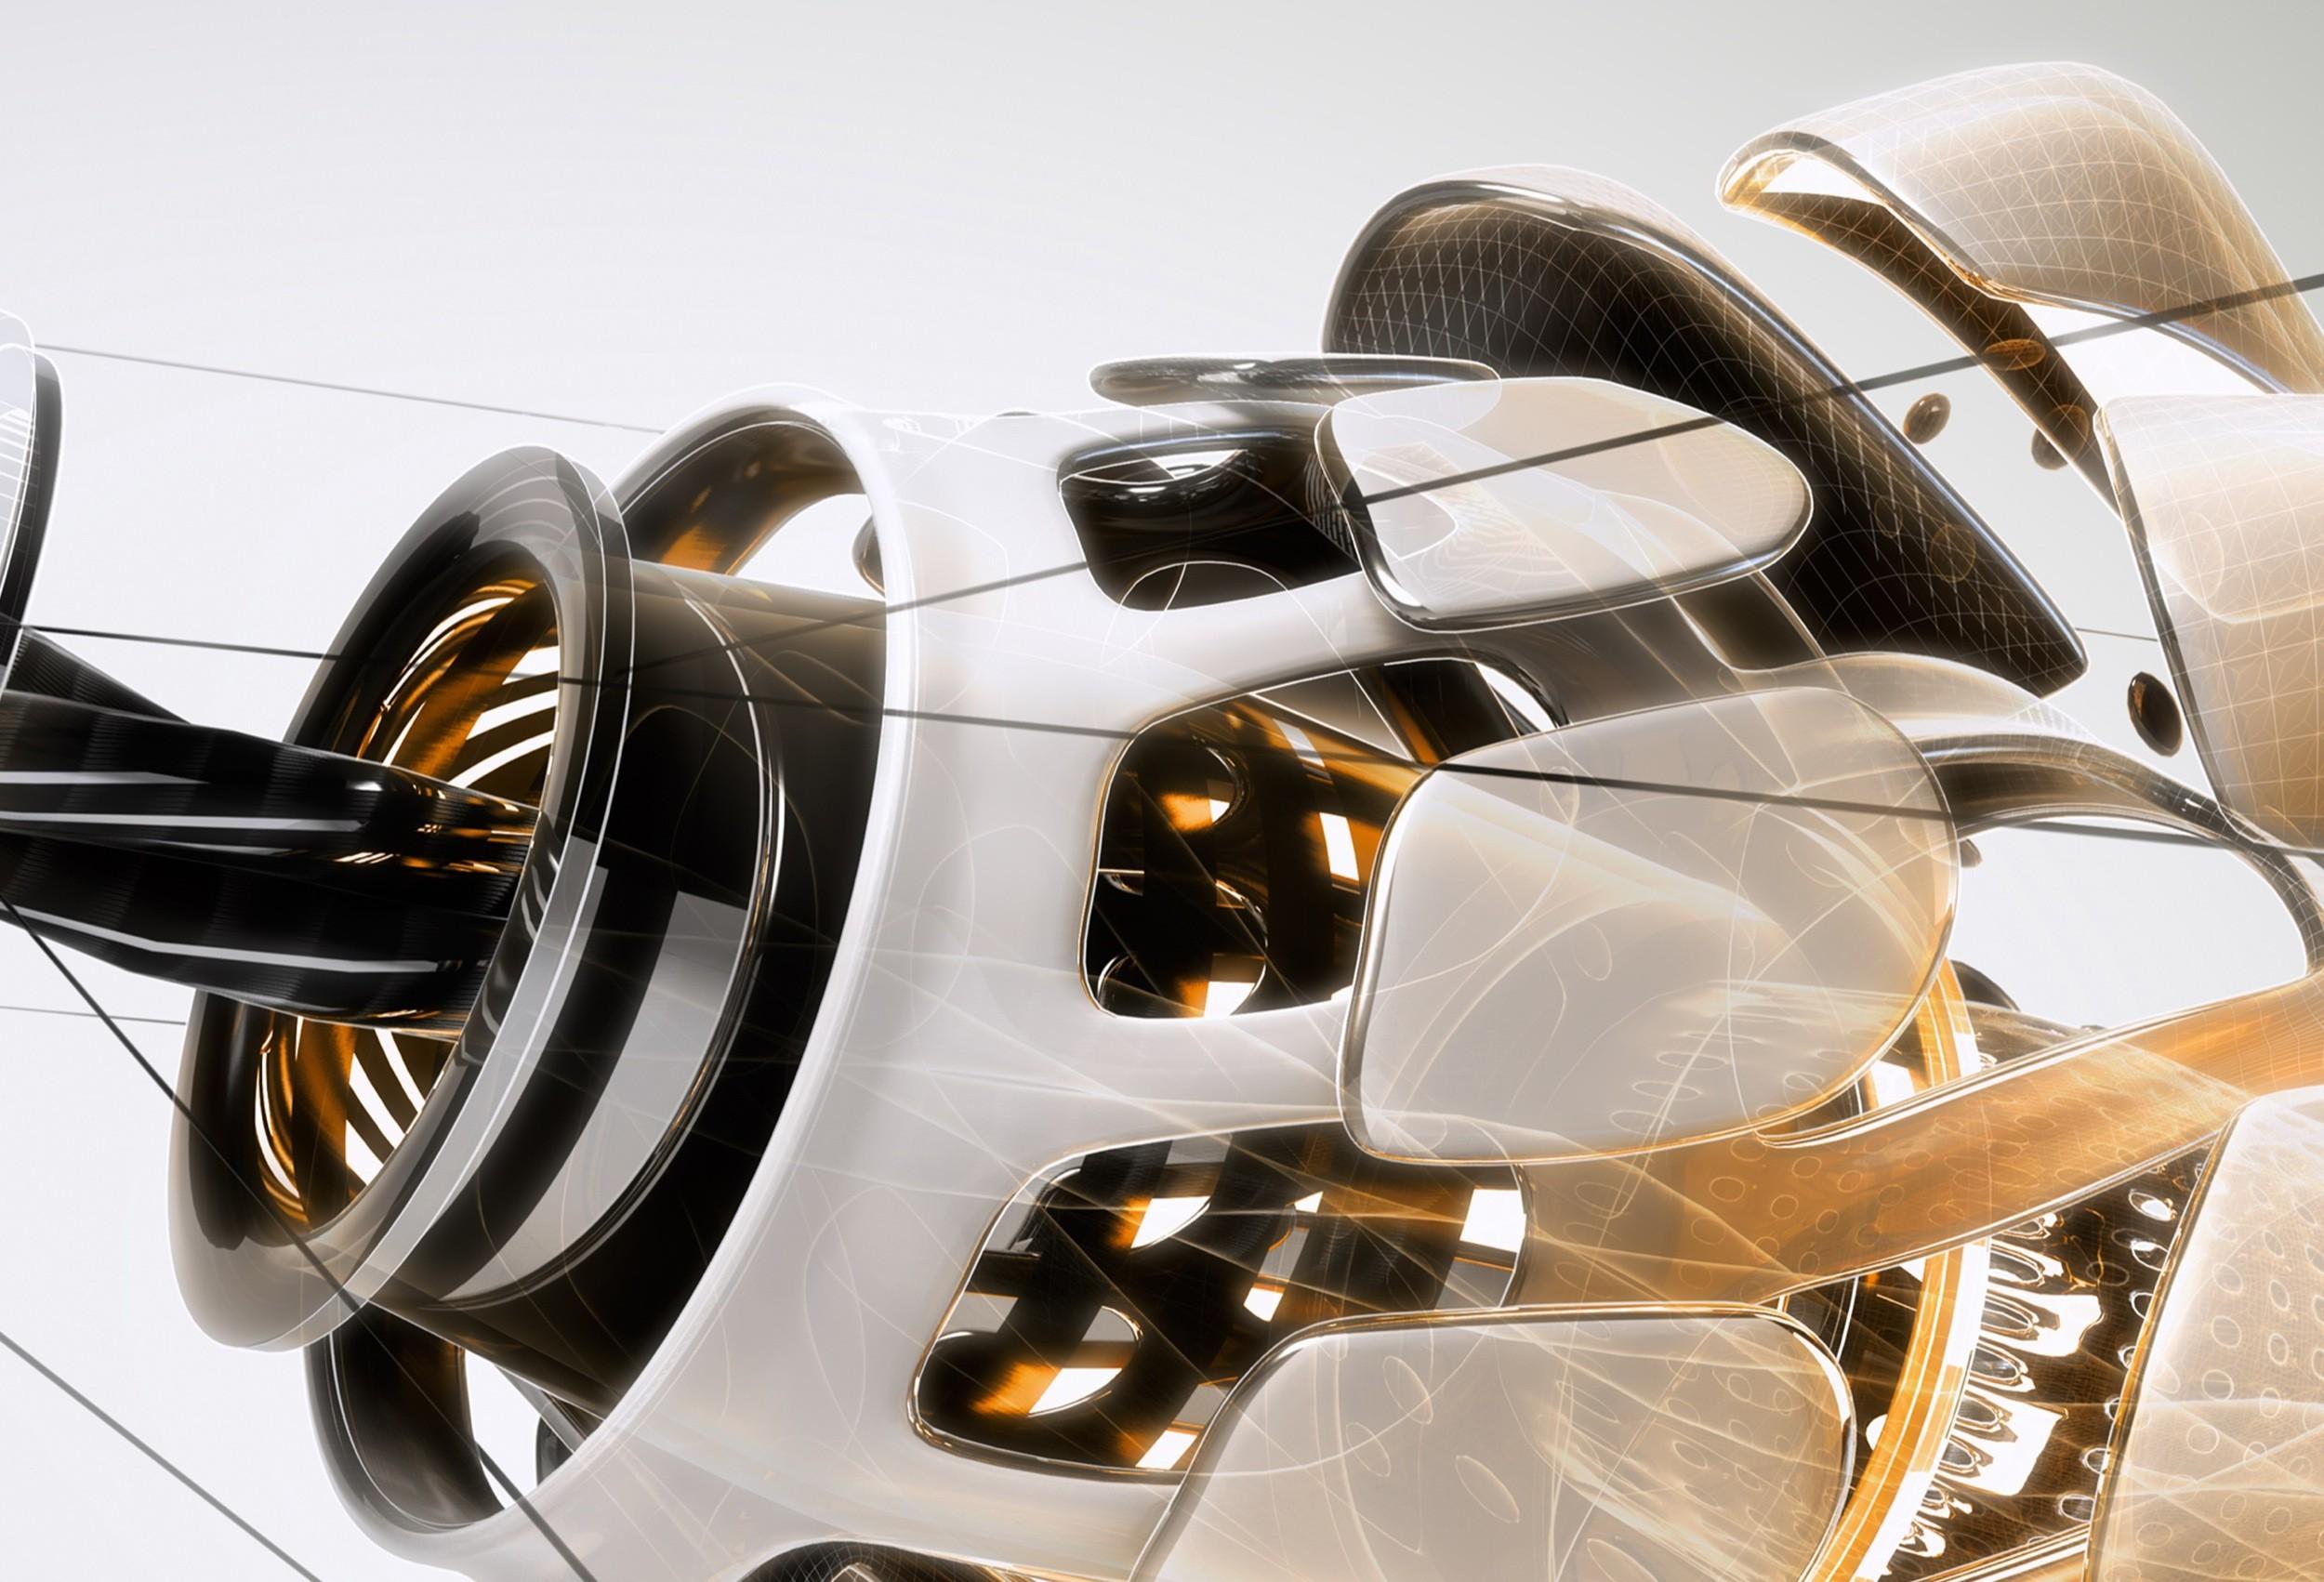 Autodesk Inventor - The 3D Printing Design Tutorial